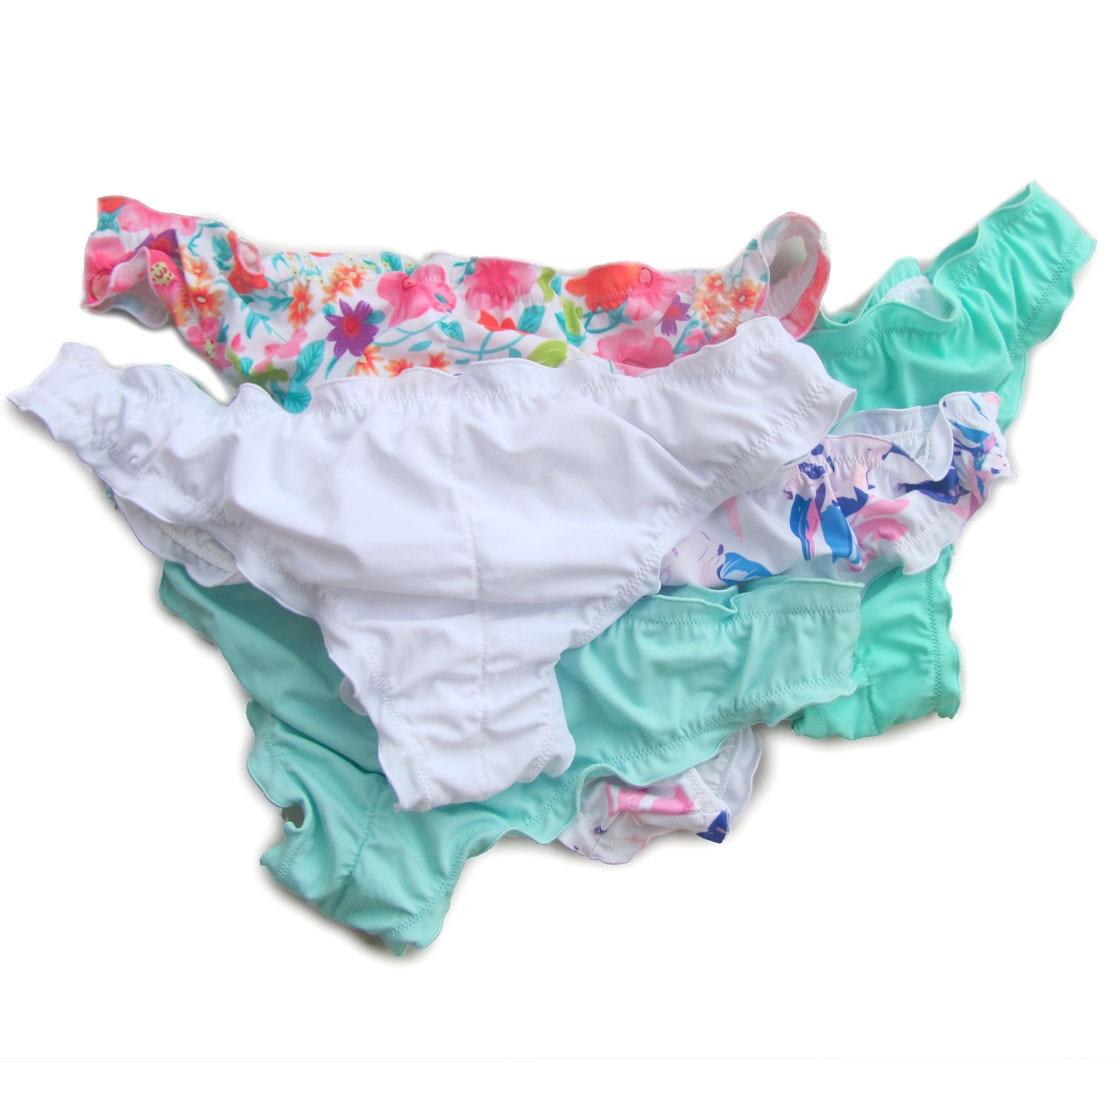 Bikini bottom 2017 Biquini Bikiny bikini swimwear bikini bottom swimsuit bow brand swim suit women United States Brazil cheeky roth veronica divergent 3 allegiant film tie in